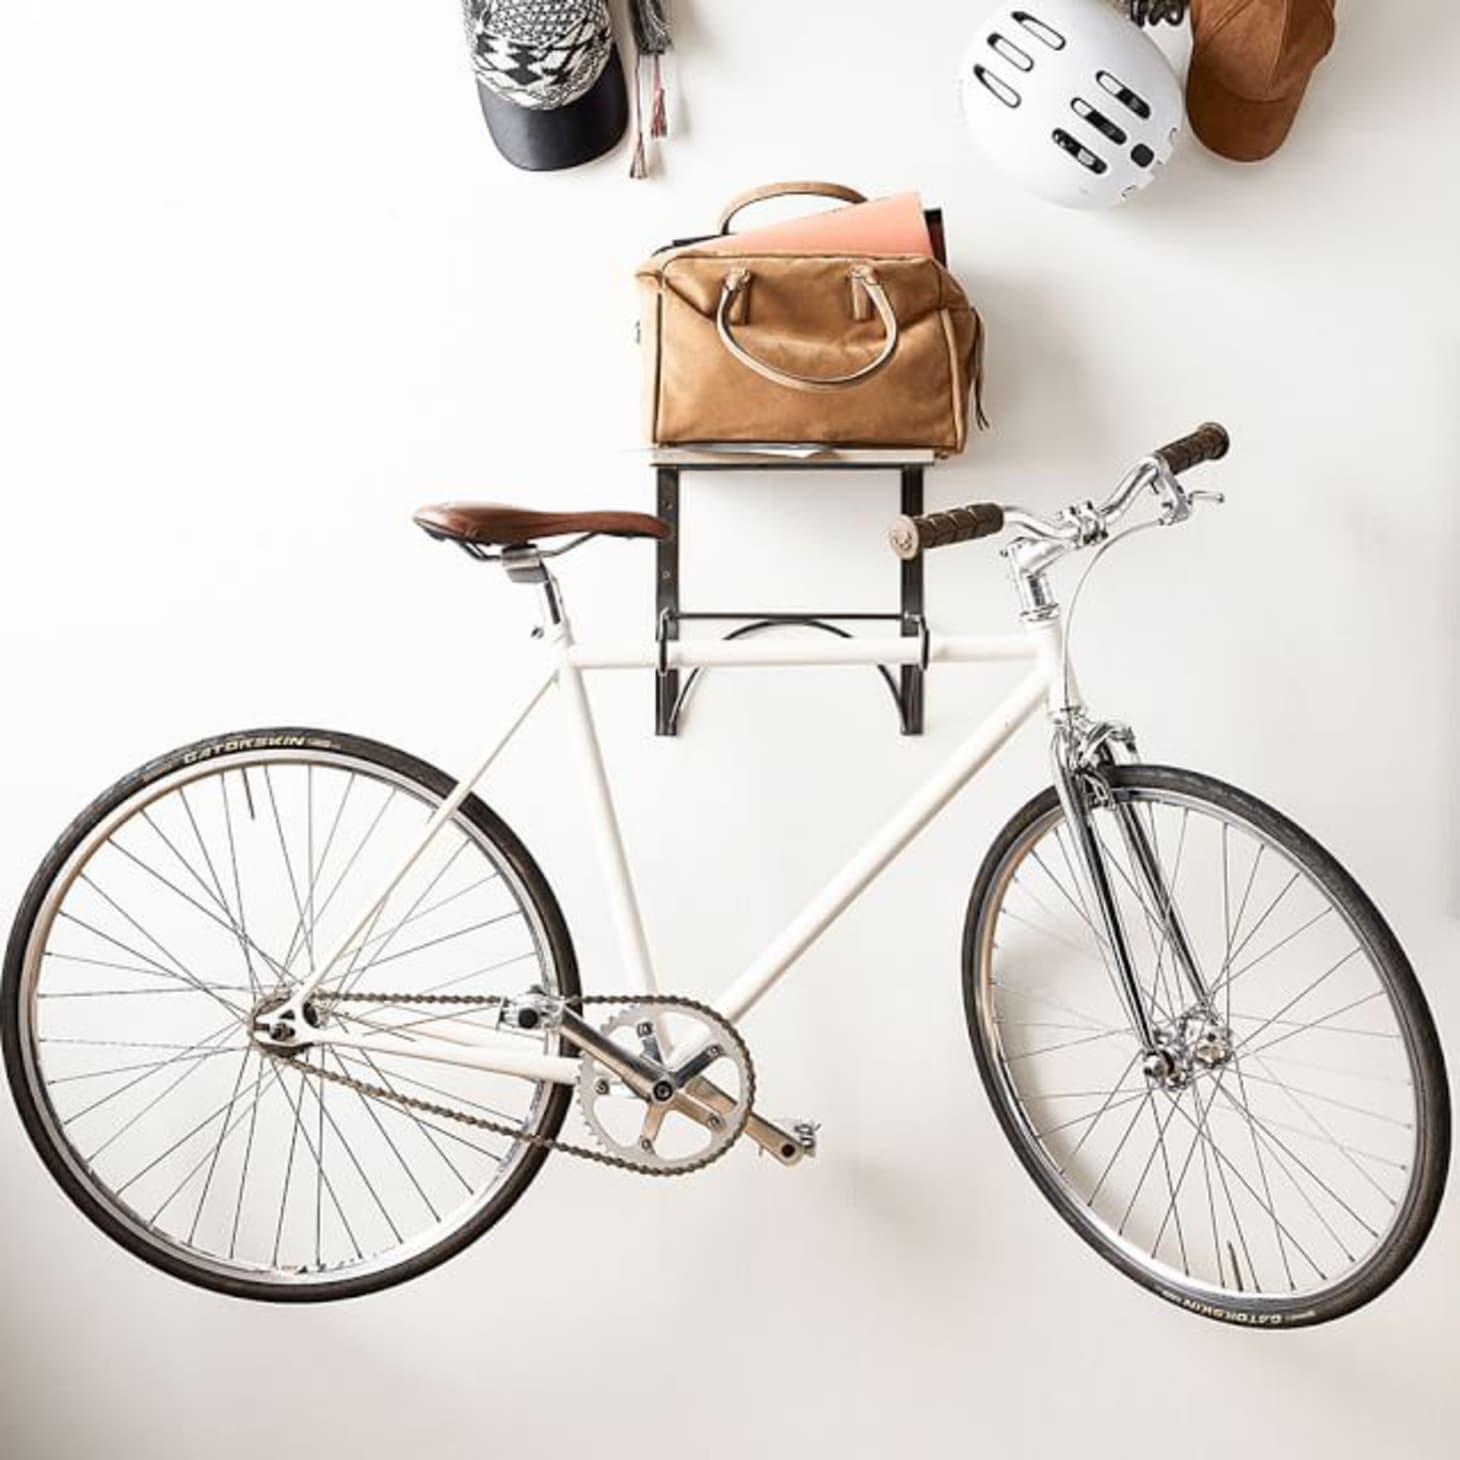 11 Space-Saving Indoor Bike Storage Solutions | Apartment ...